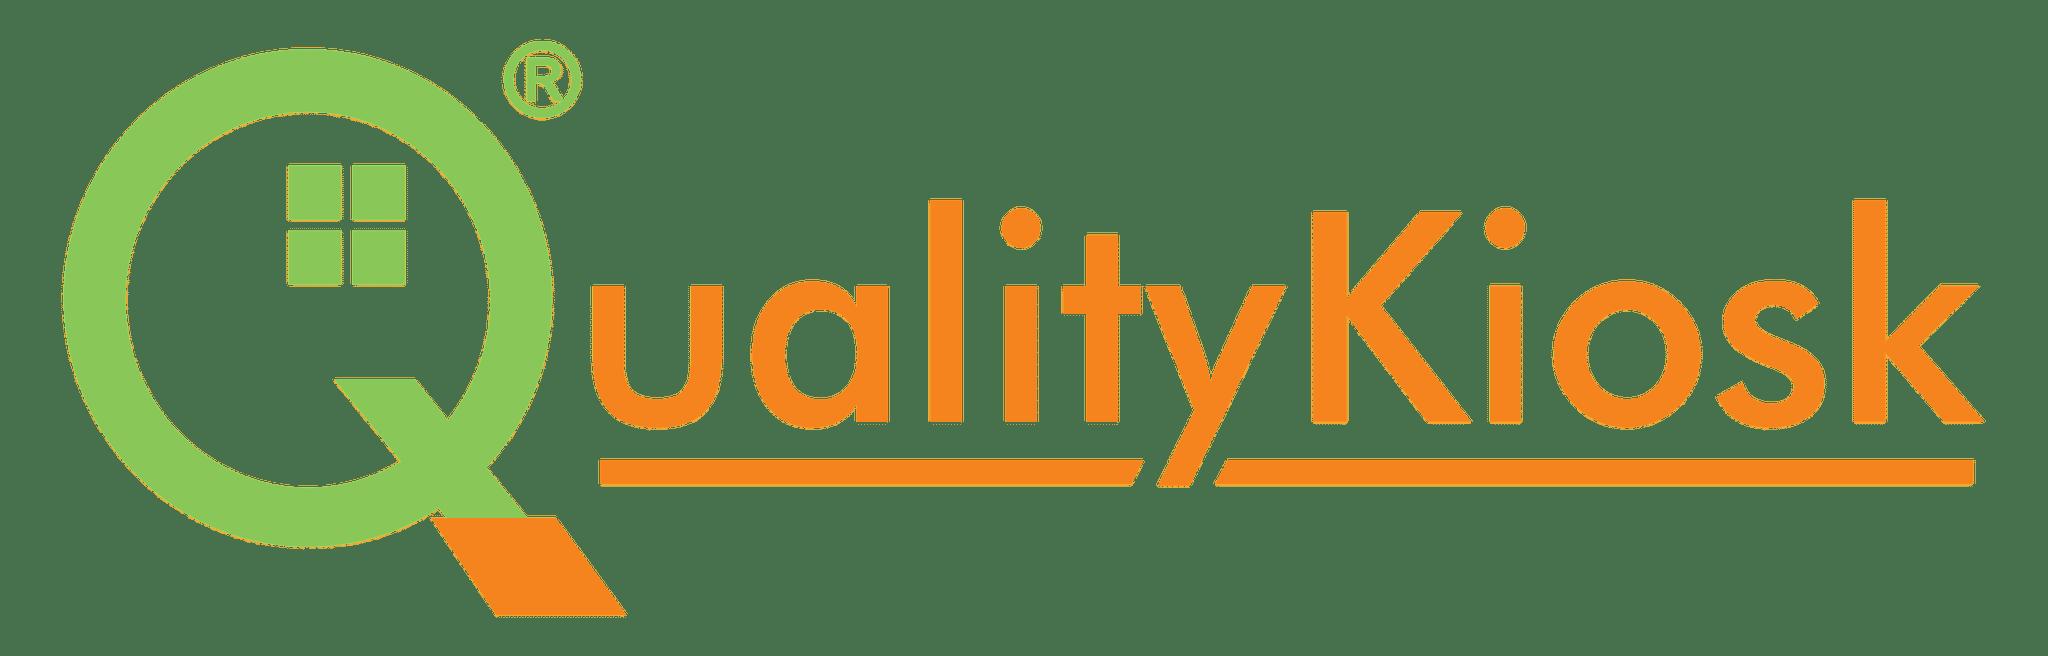 Qualitykiosk Recruitment 2020 | Qualitykiosk Hiring Trainee Engineer